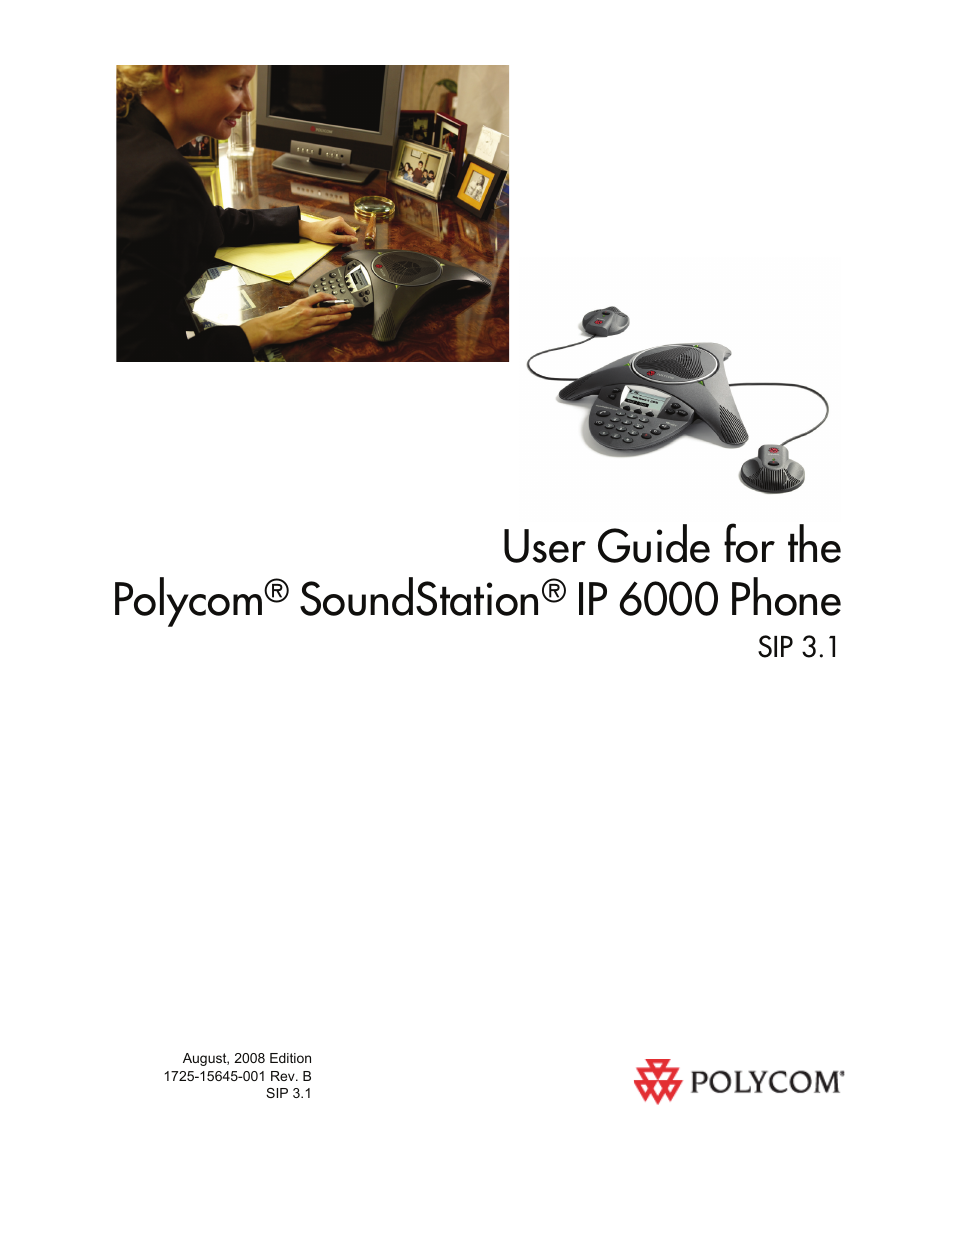 polycom soundstation ip 6000 user manual 86 pages rh manualsdir com polycom soundstation ip 6000 configuration guide polycom soundstation ip 6000 guide